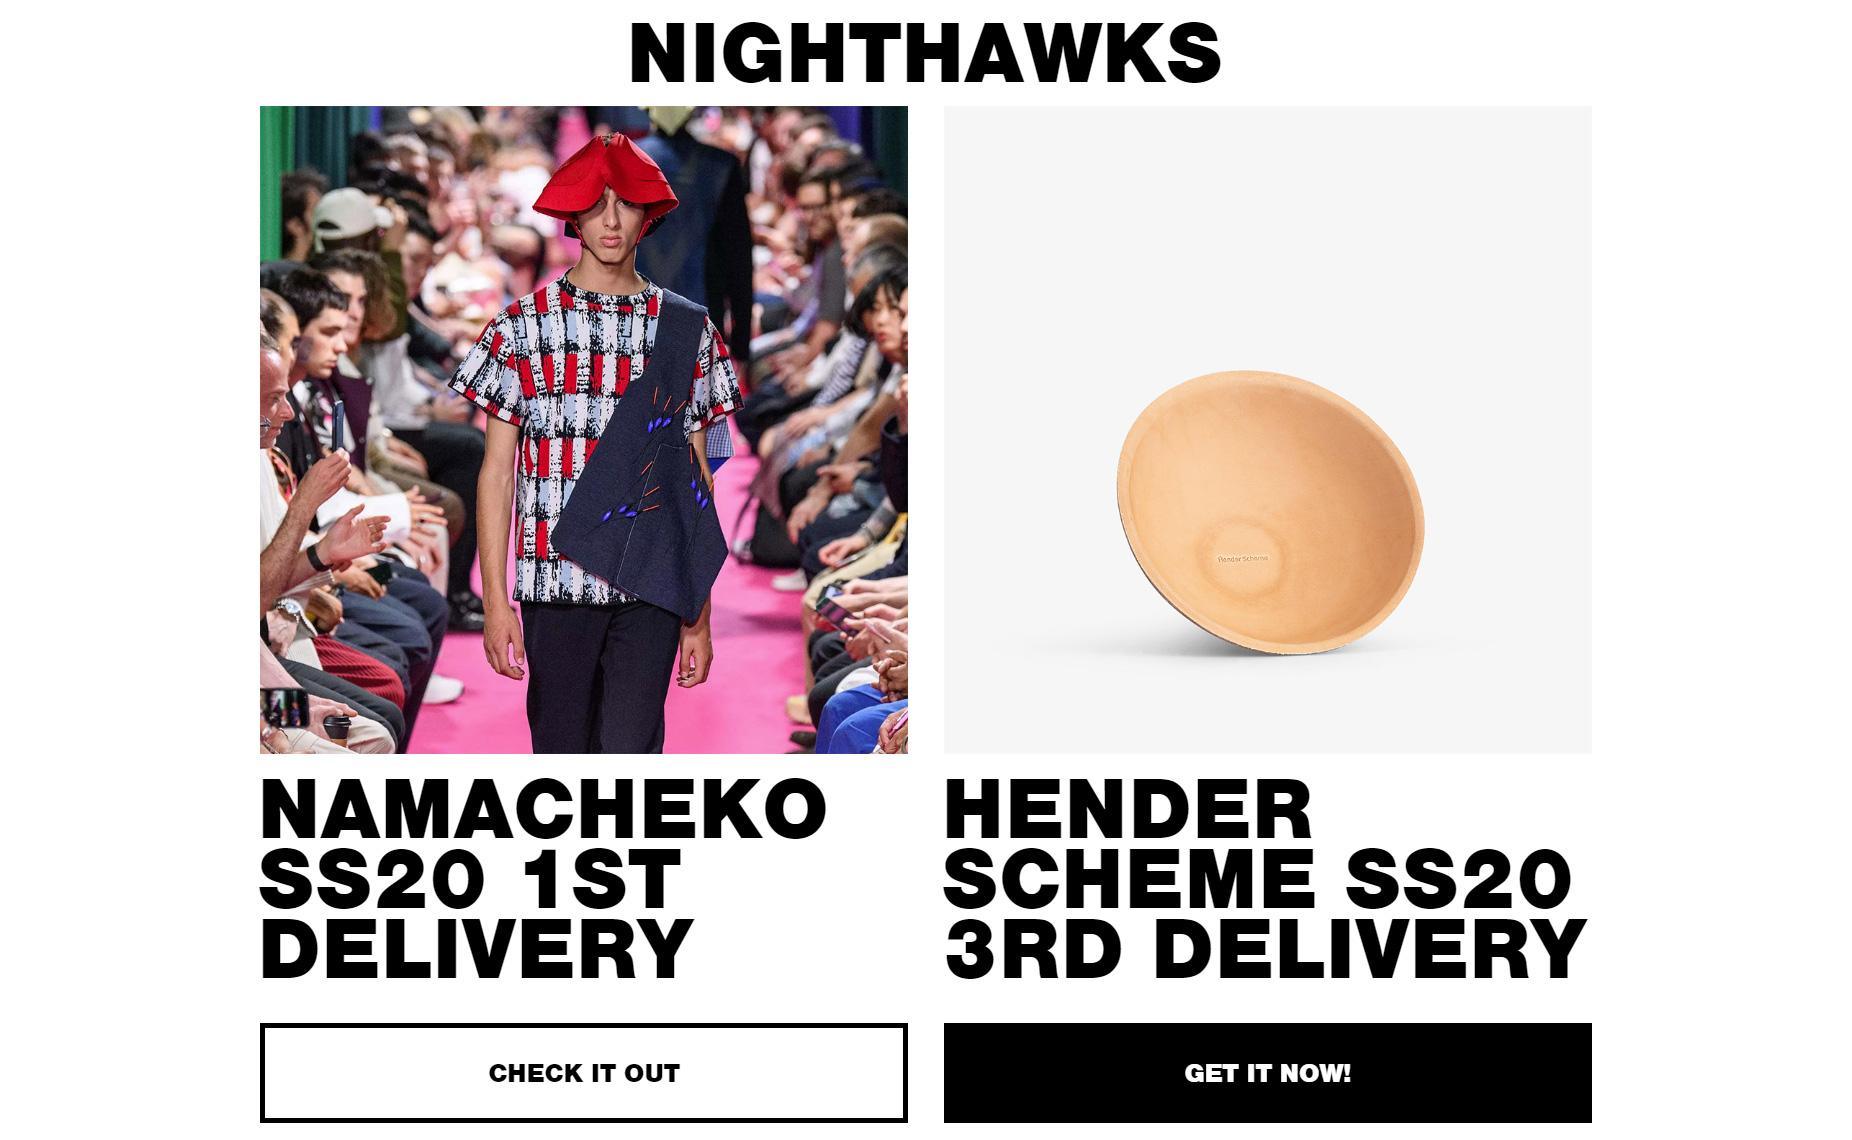 Nighthawks - Website of the Day